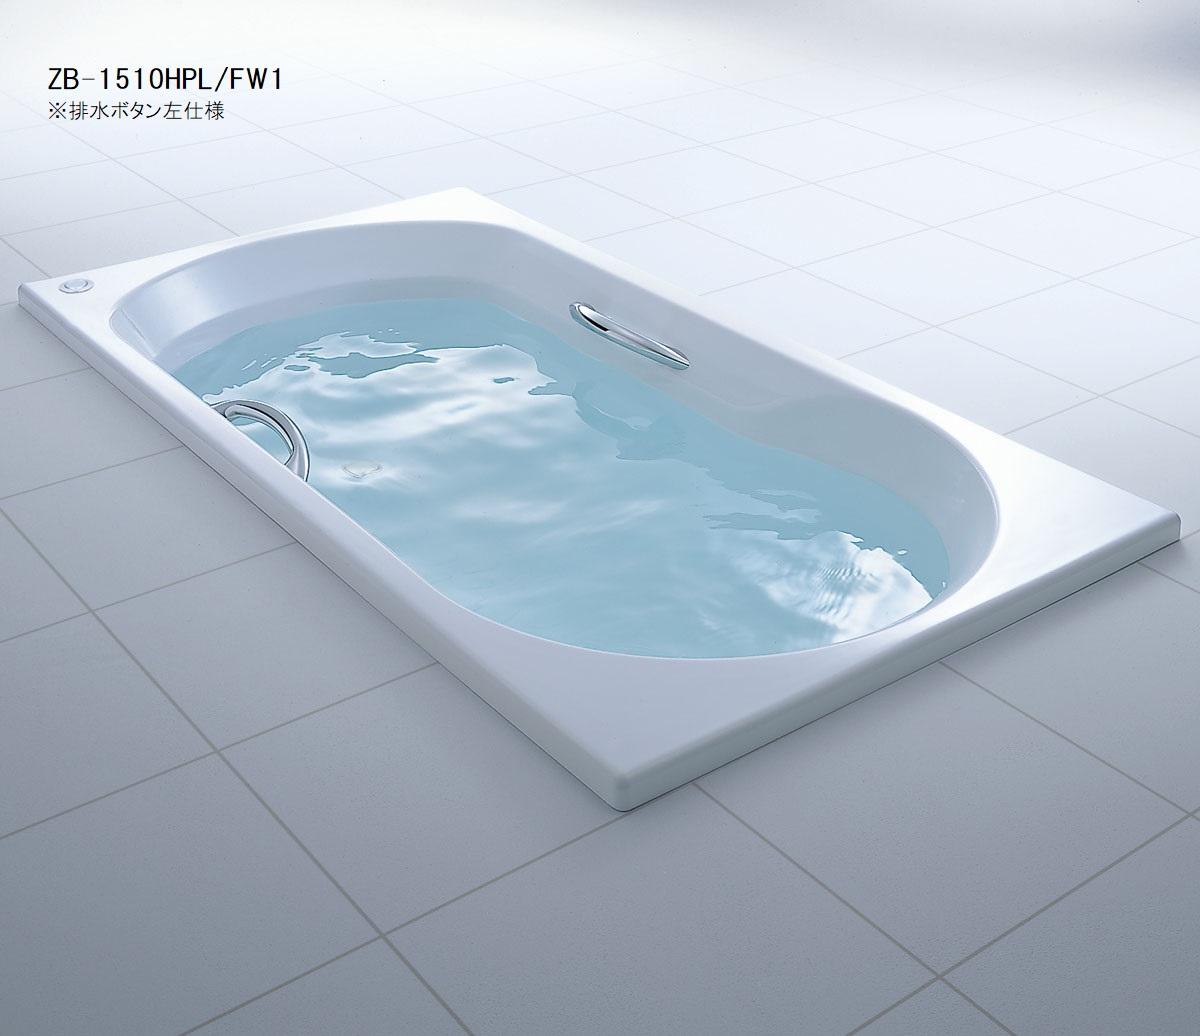 INAX 浴槽バスタブ ZB-1510HP 【アーバンシリーズ】【1500サイズ】【エプロンなし】【メーカー直送品】